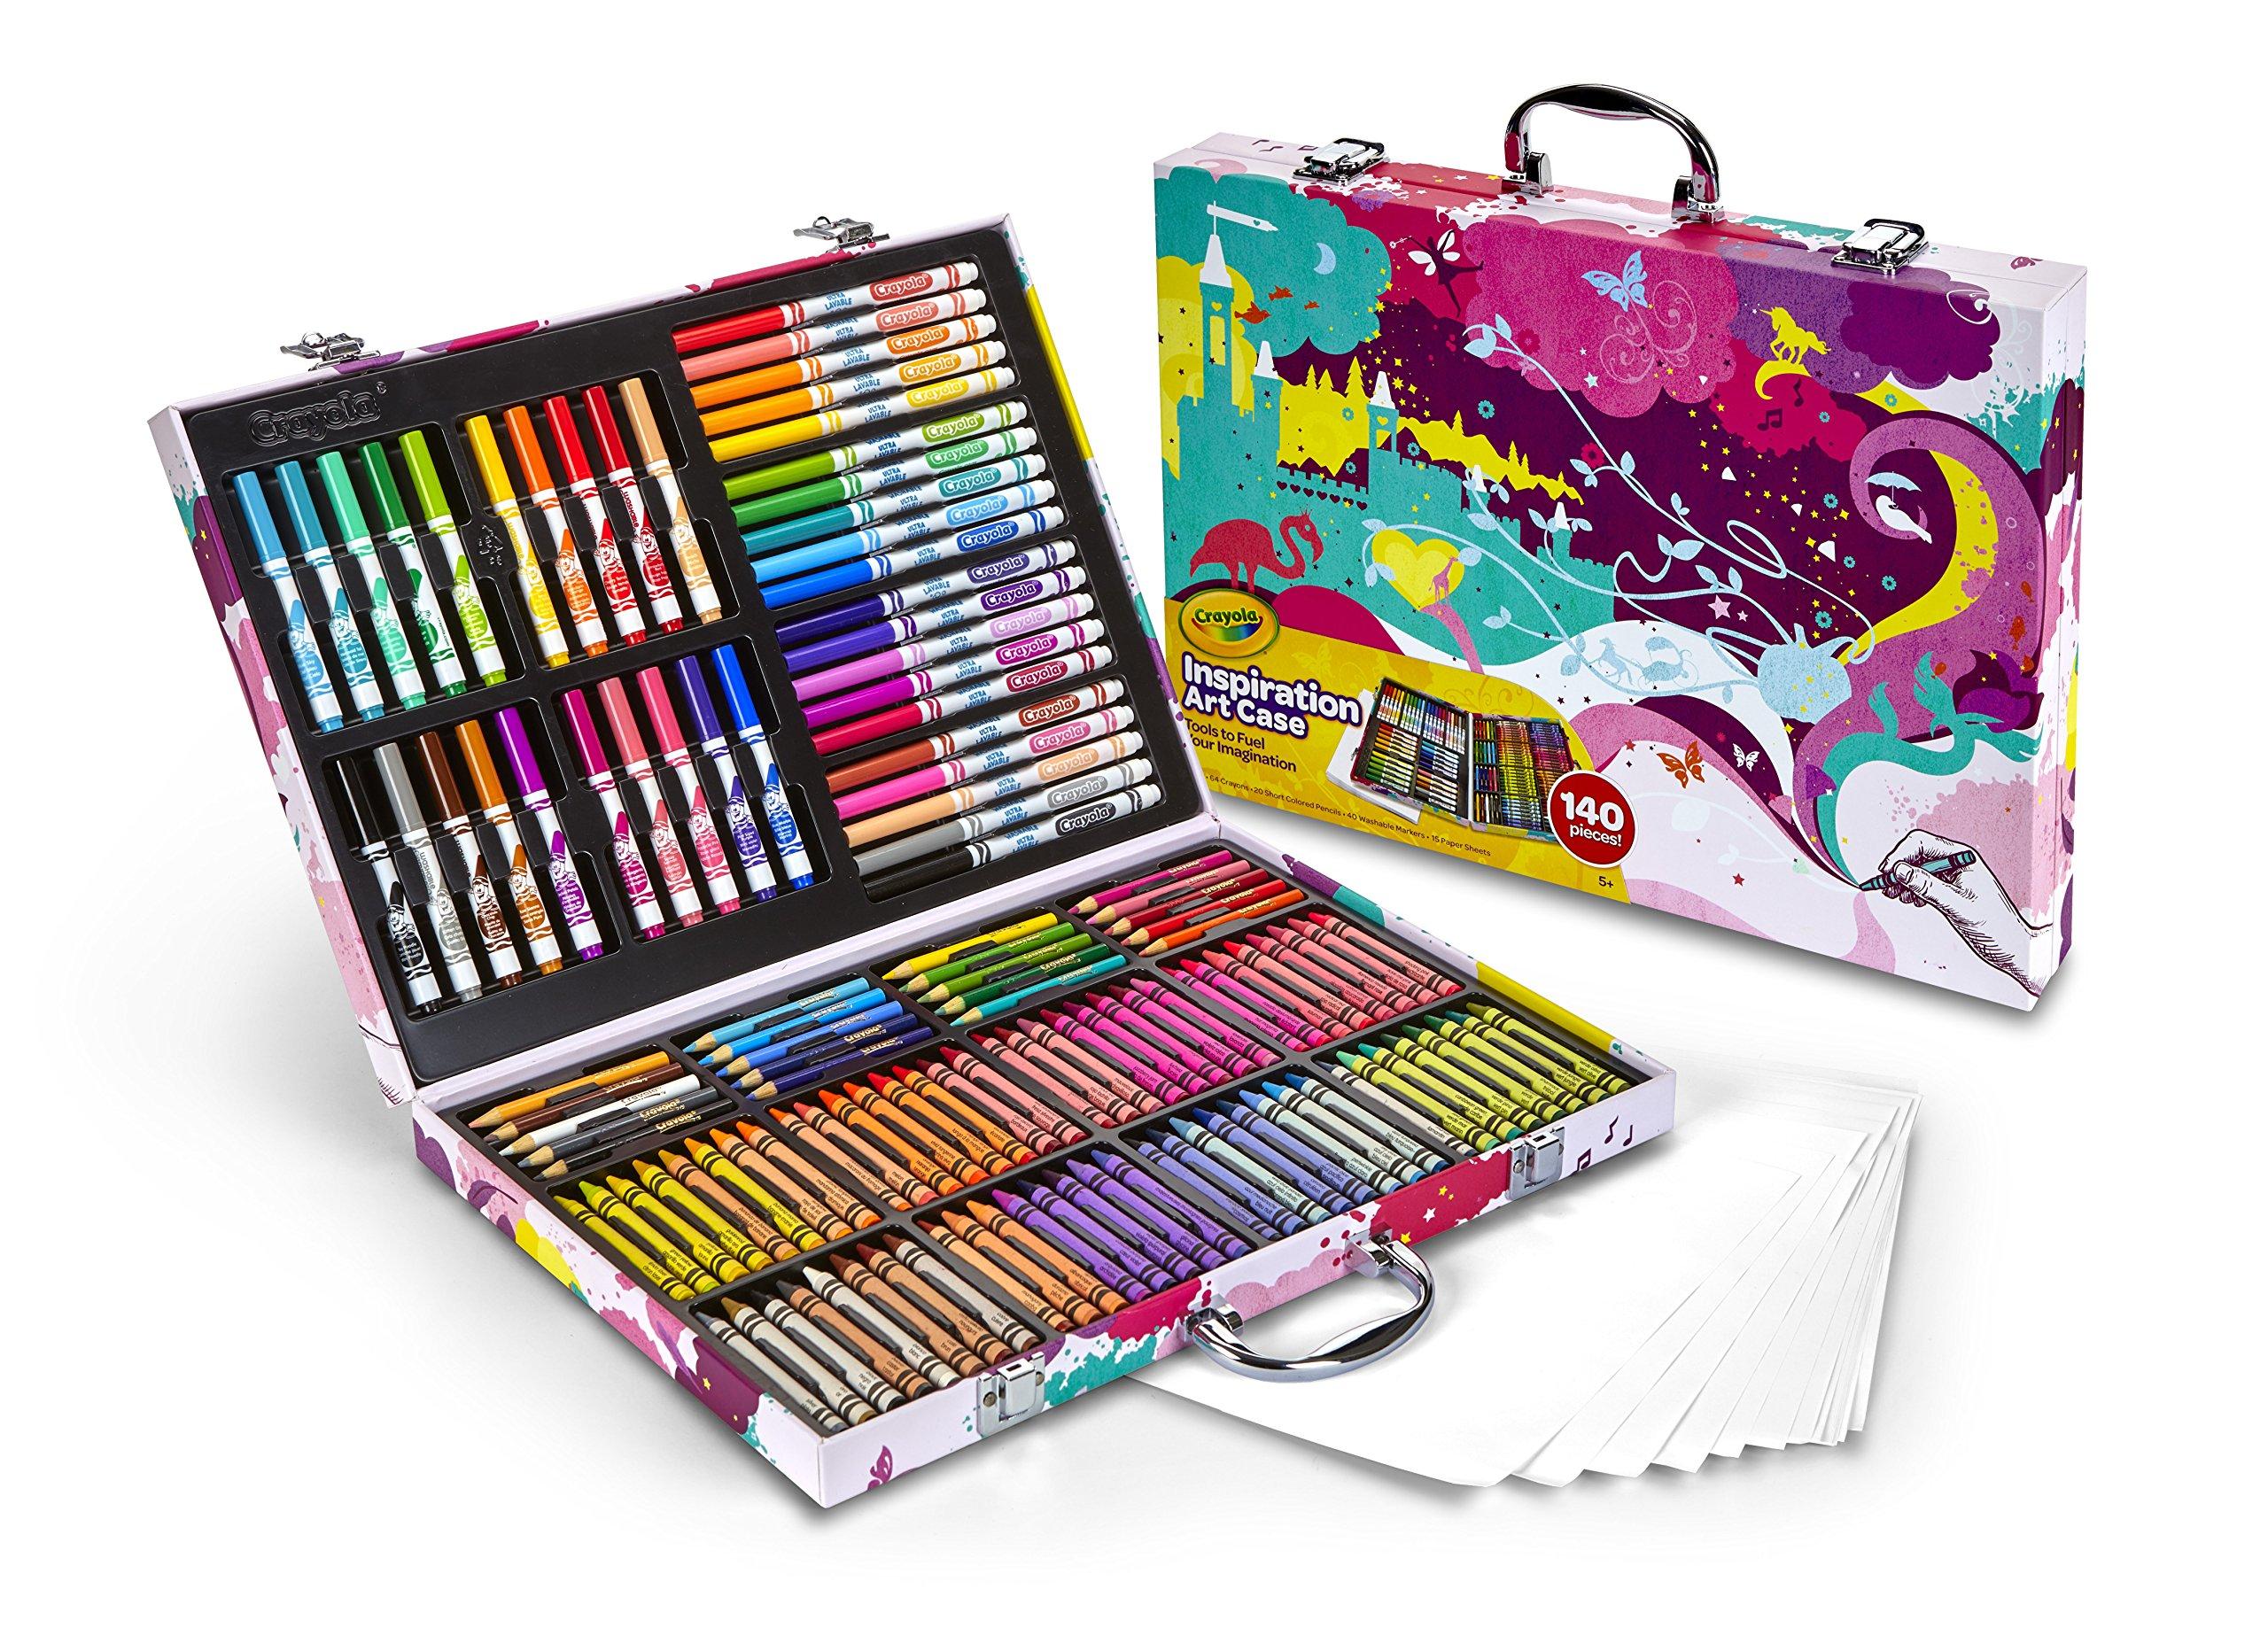 Crayola Inspiration Art Case In Pink by Crayola